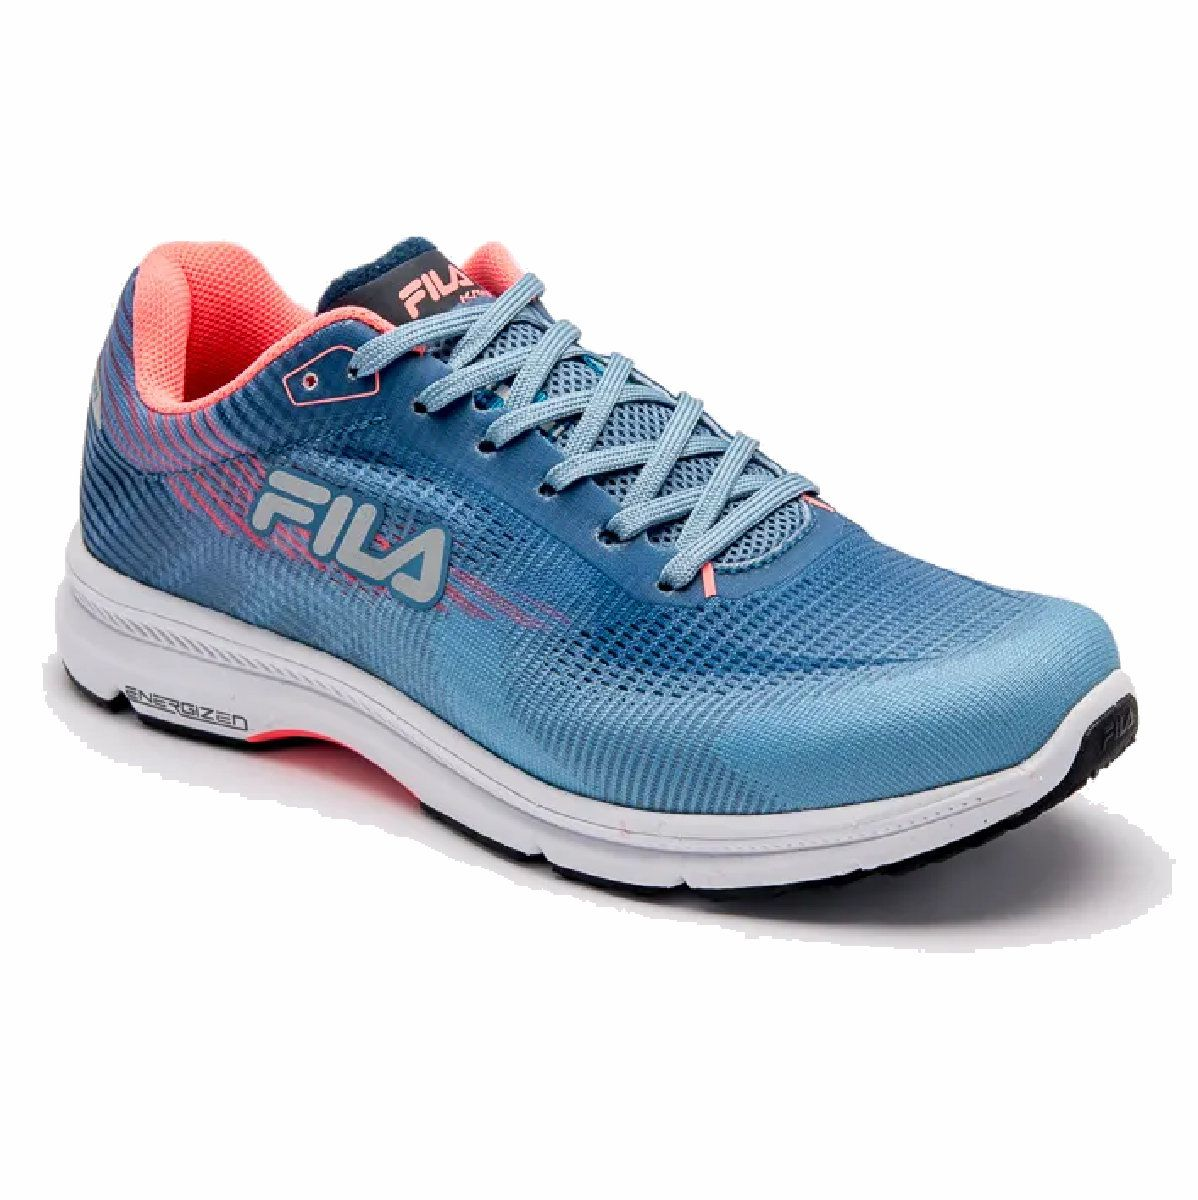 Tenis Fila Kr4 Kenya Racer 4 Feminino Running Performance Nova Cor